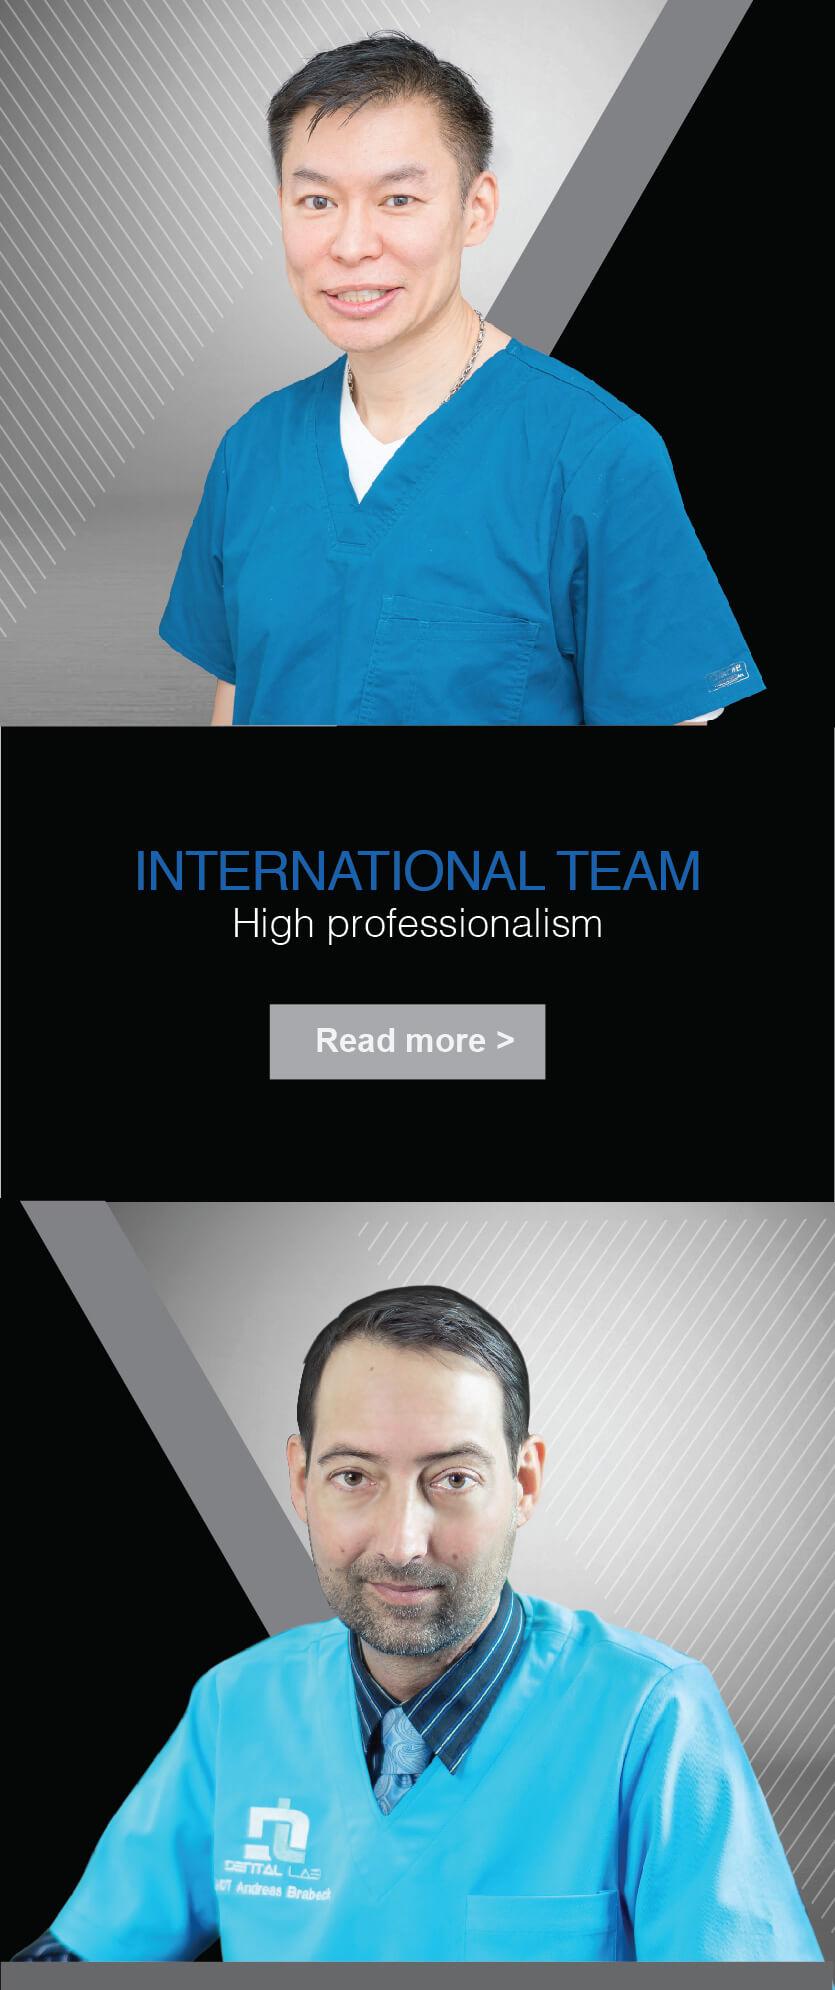 international-and-professionalism-dentist-team-at-westcoast-dental-clinic